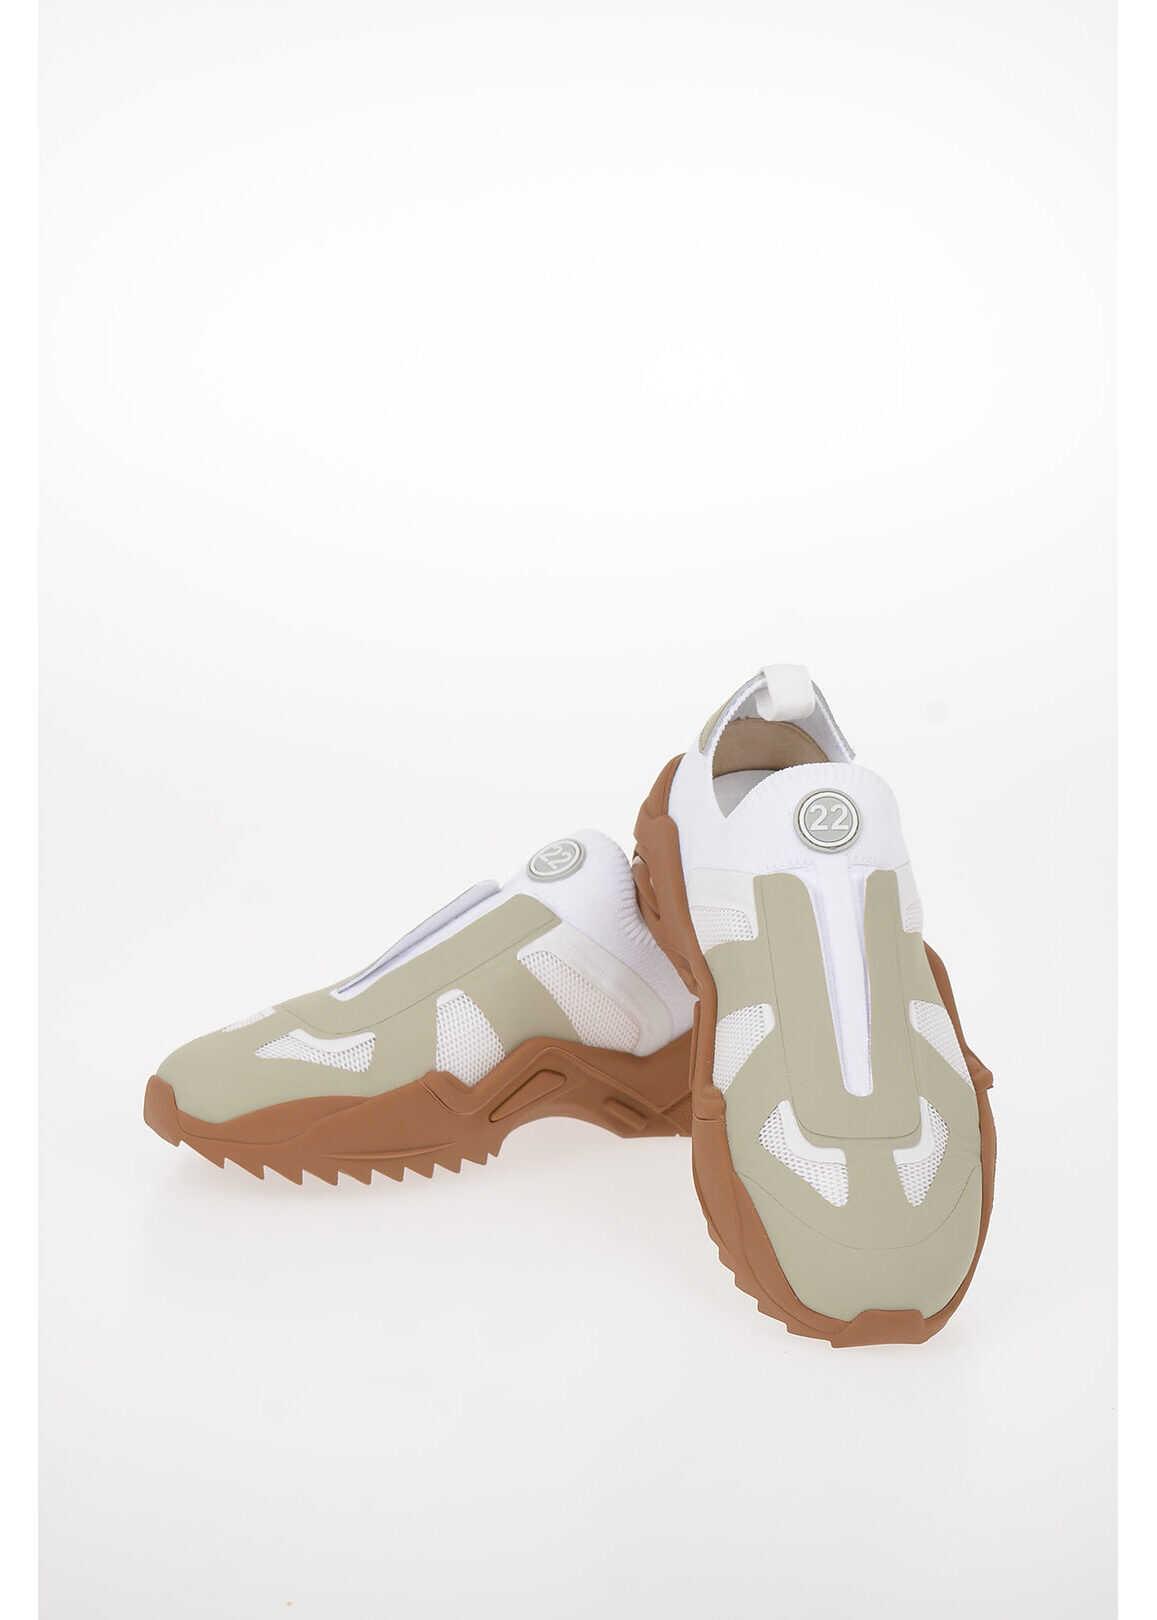 Maison Margiela MM22 Canvas NEW REPLICA Slip On Sneakers WHITE imagine b-mall.ro